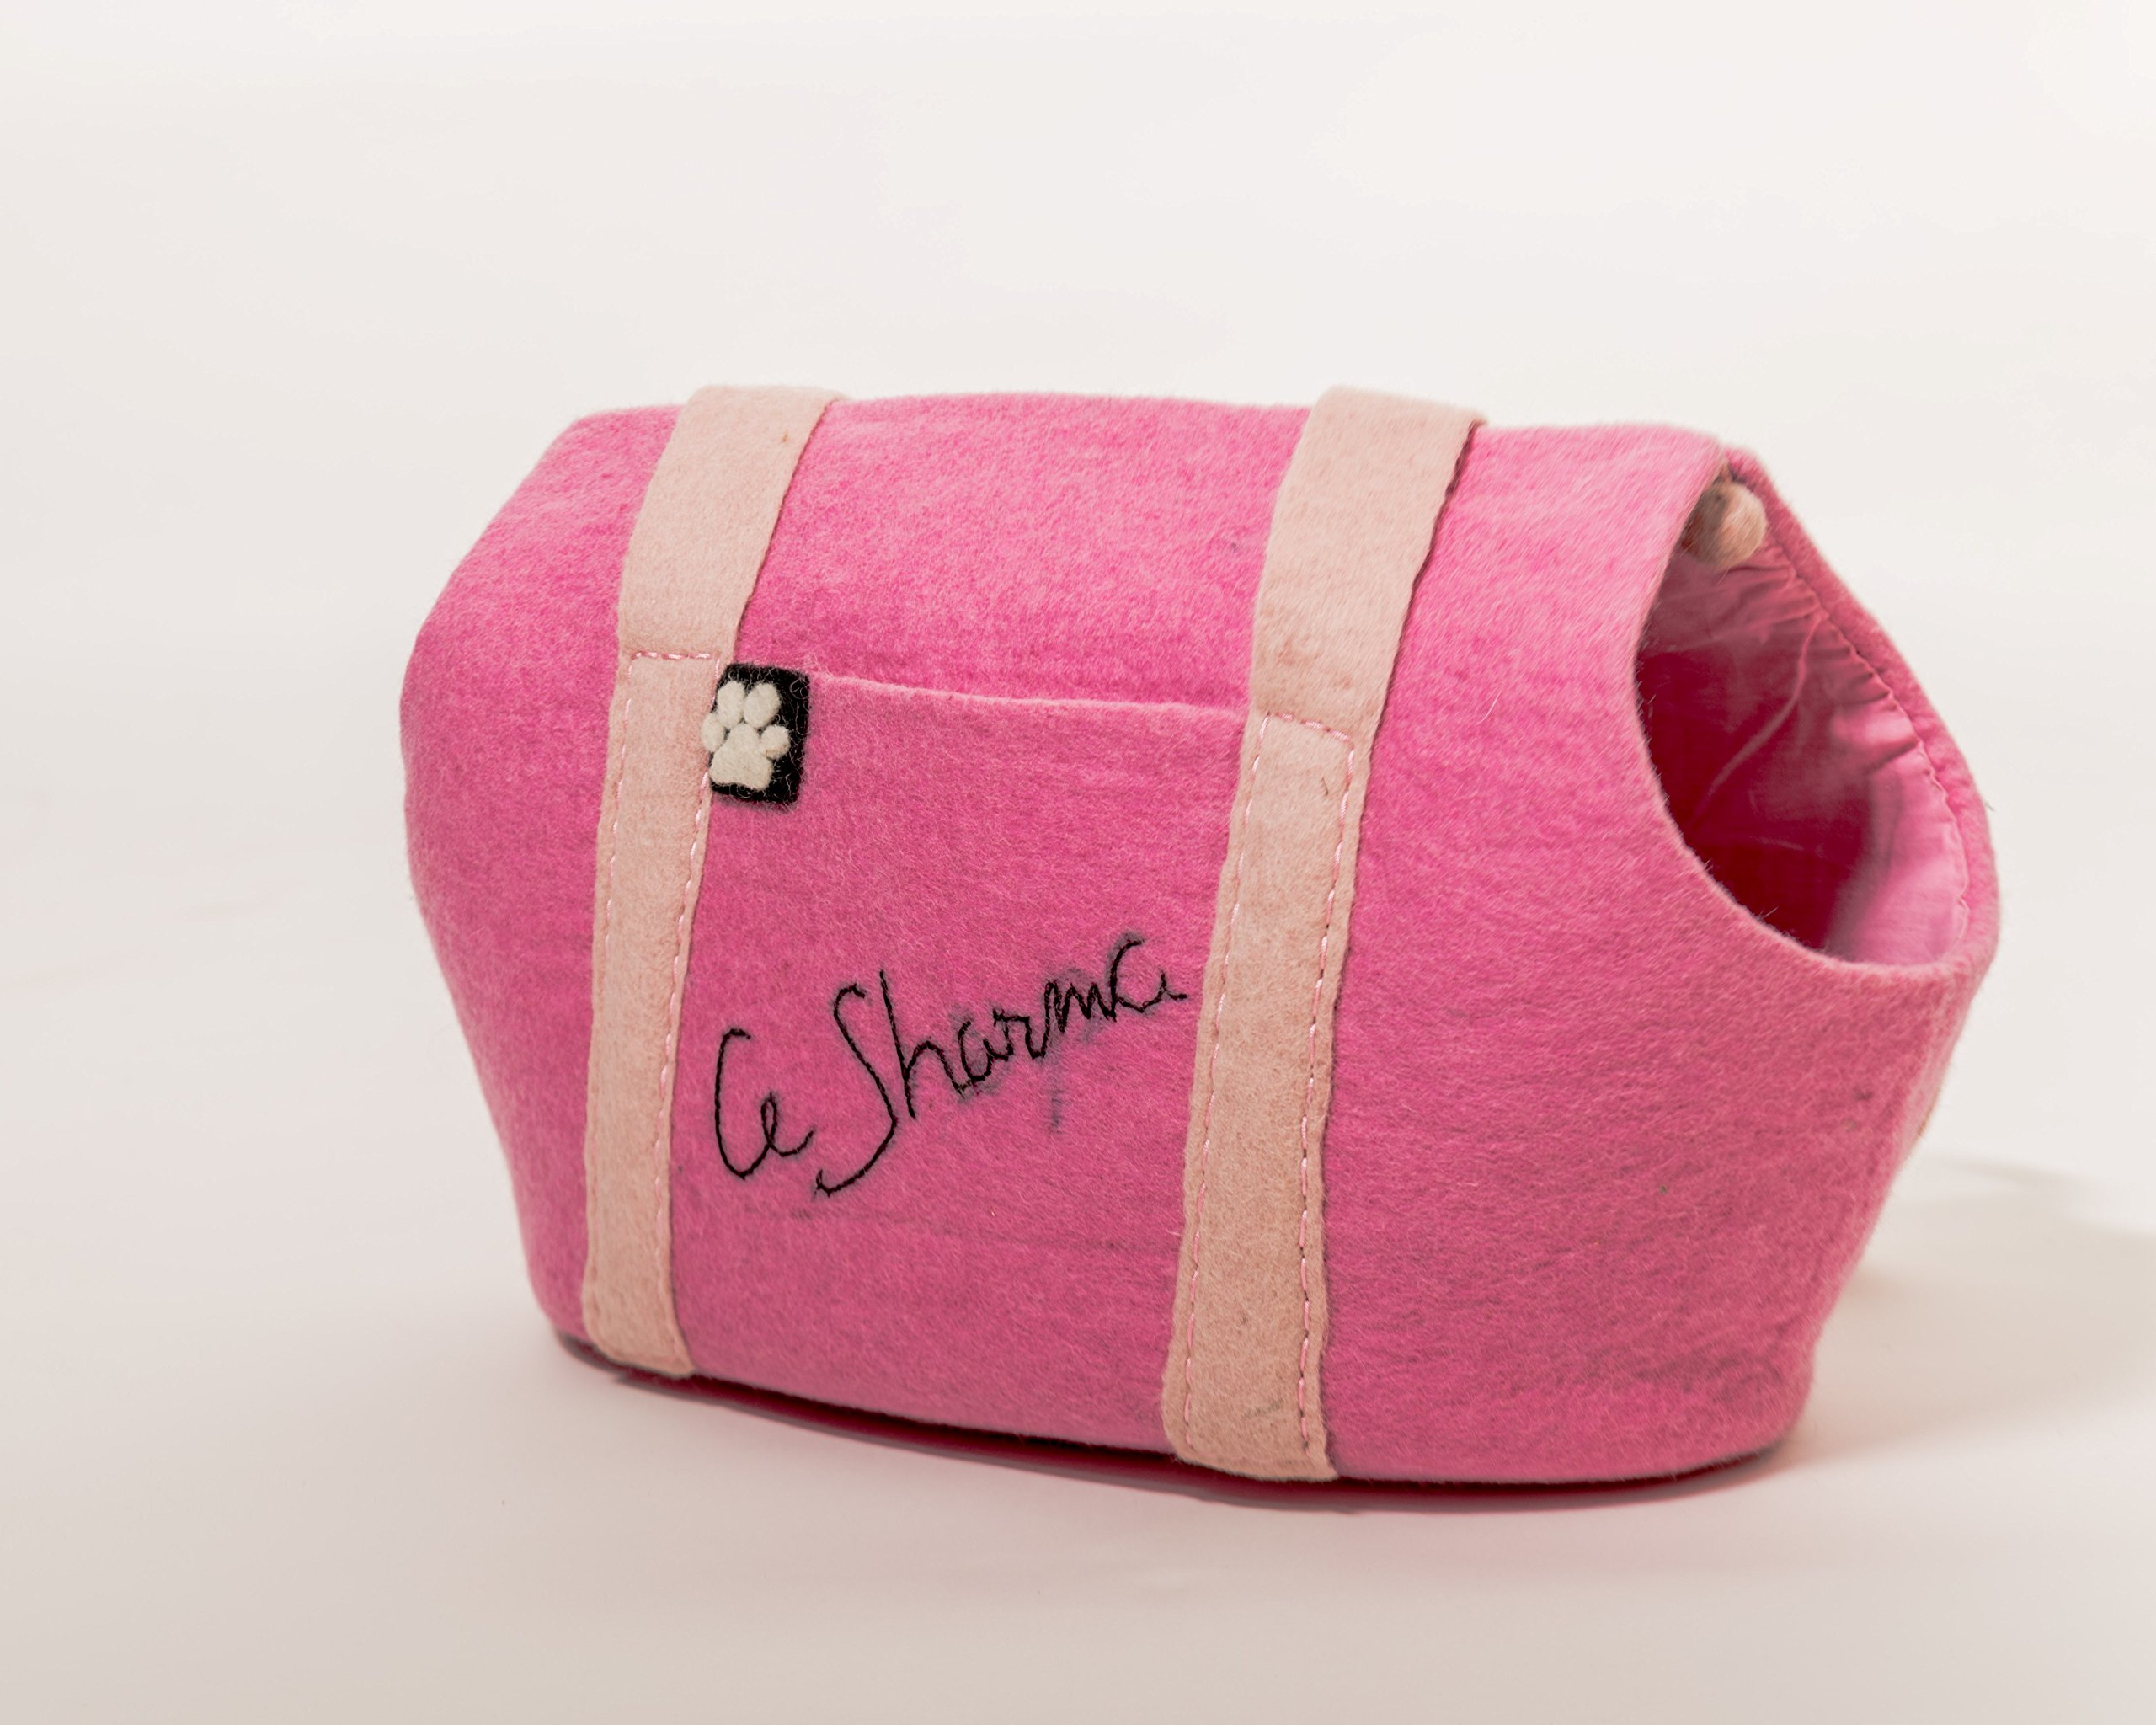 Le Sharma Felt-Dog Carrier, Warm Luxurious 100% Wool, Handmade, Ideal for Small Dogs (Pink)